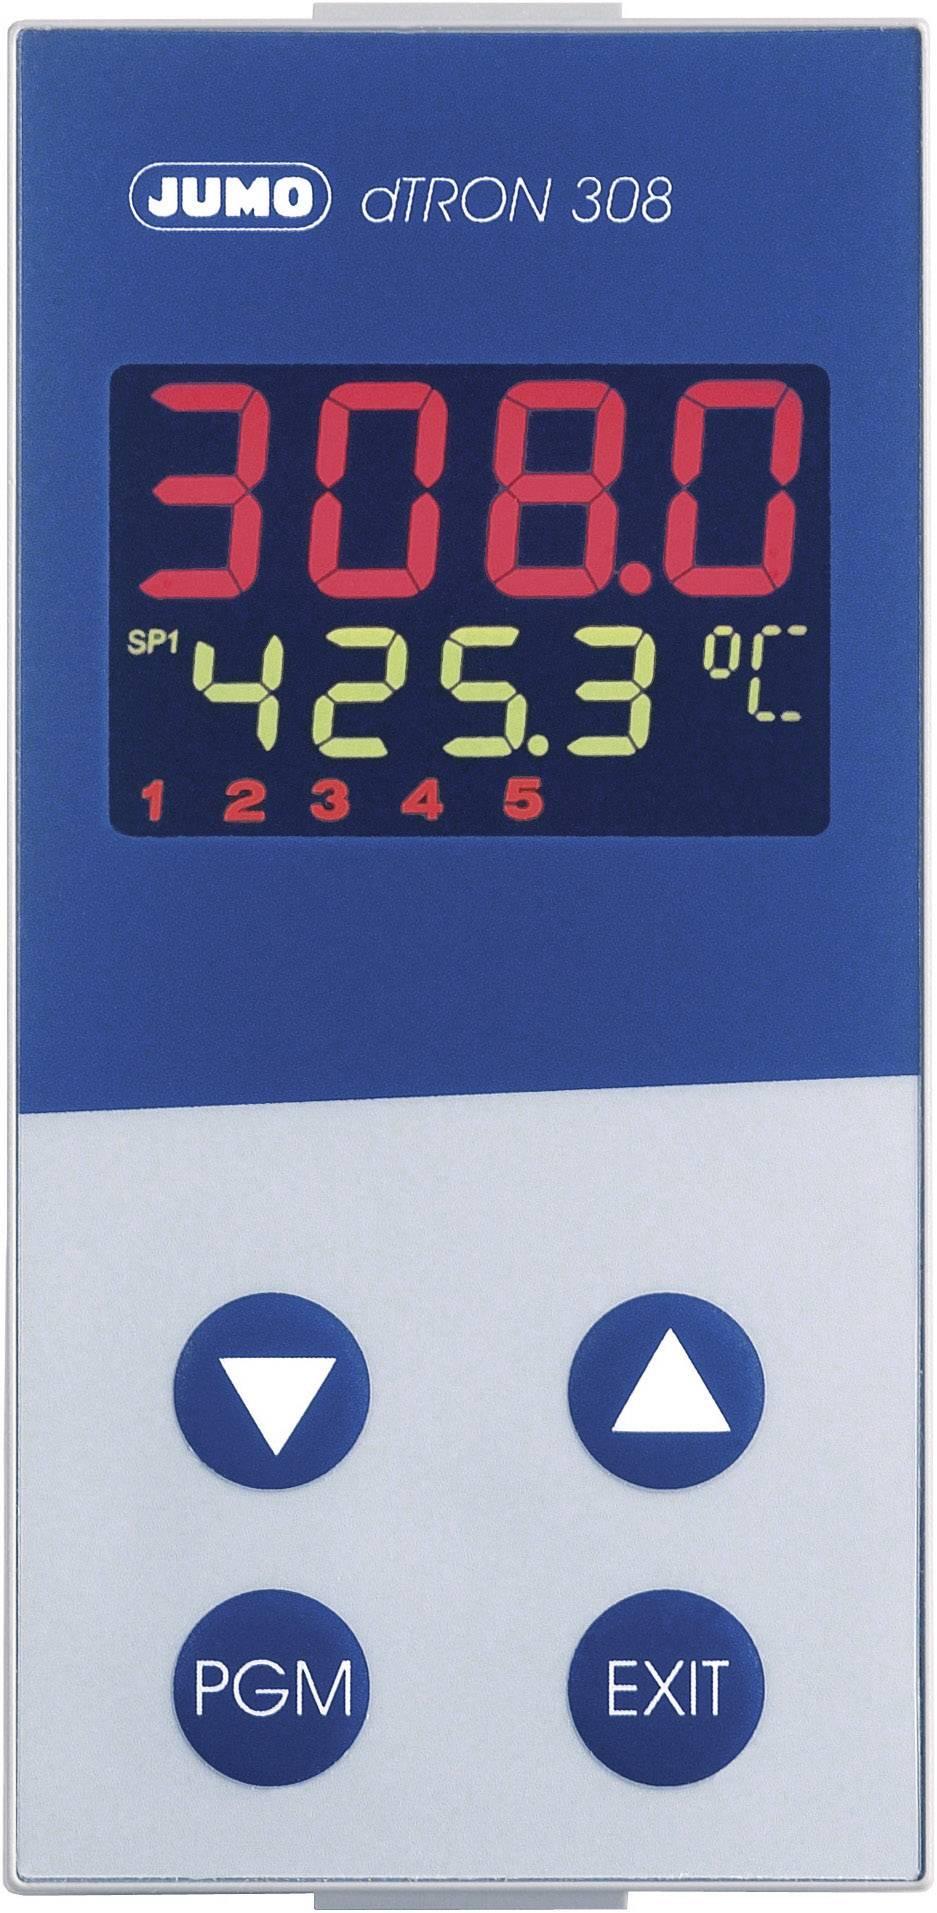 Panelový termostat JUMO dTRON 308, 110 - 240 V/AC, 48 x 96 mm